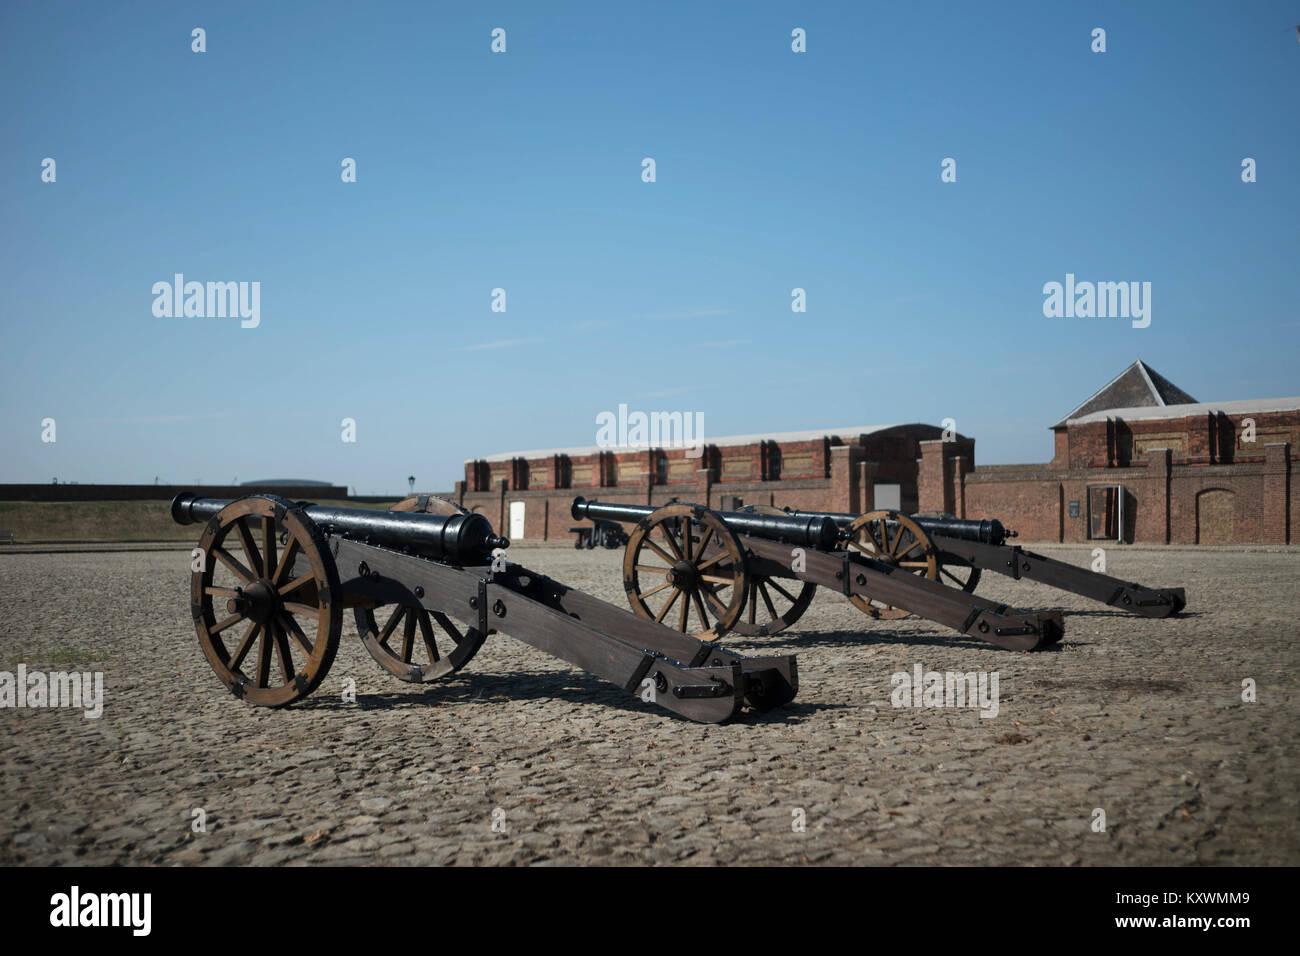 Tilbury Fort - Stock Image